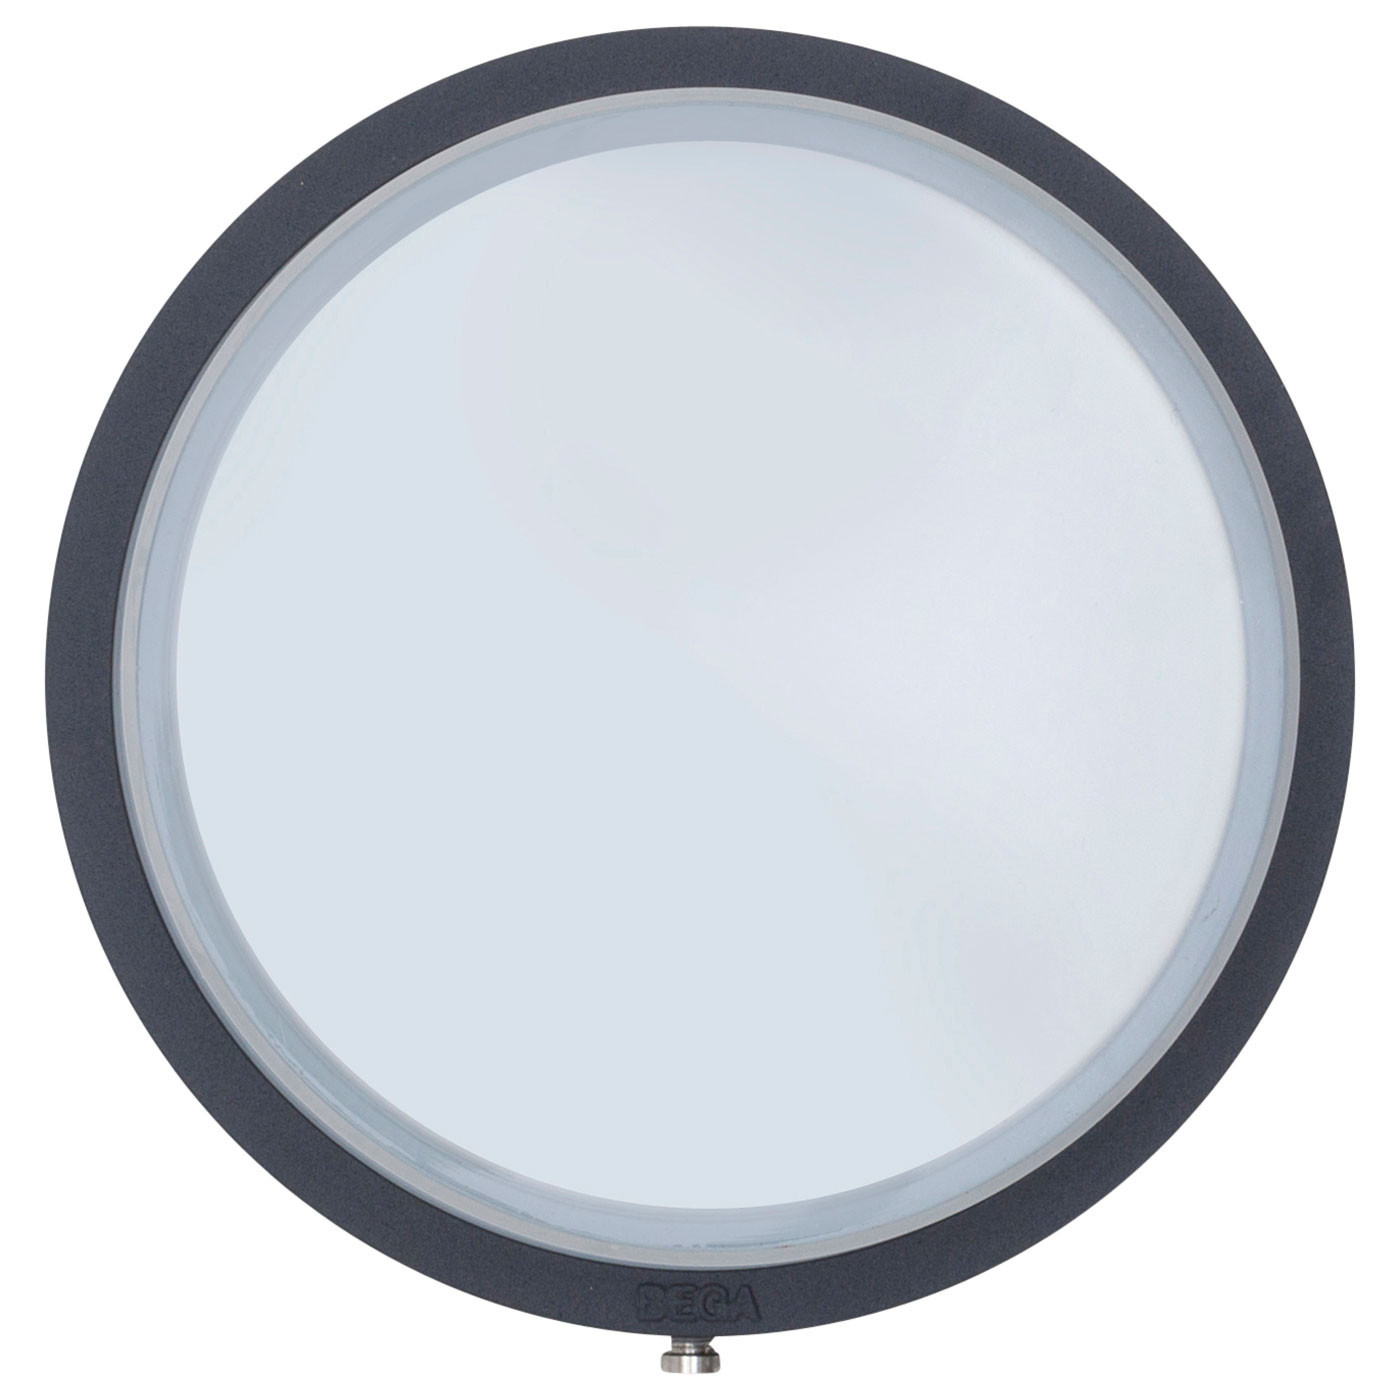 Bega 33534 LED Wand-/Deckenleuchte